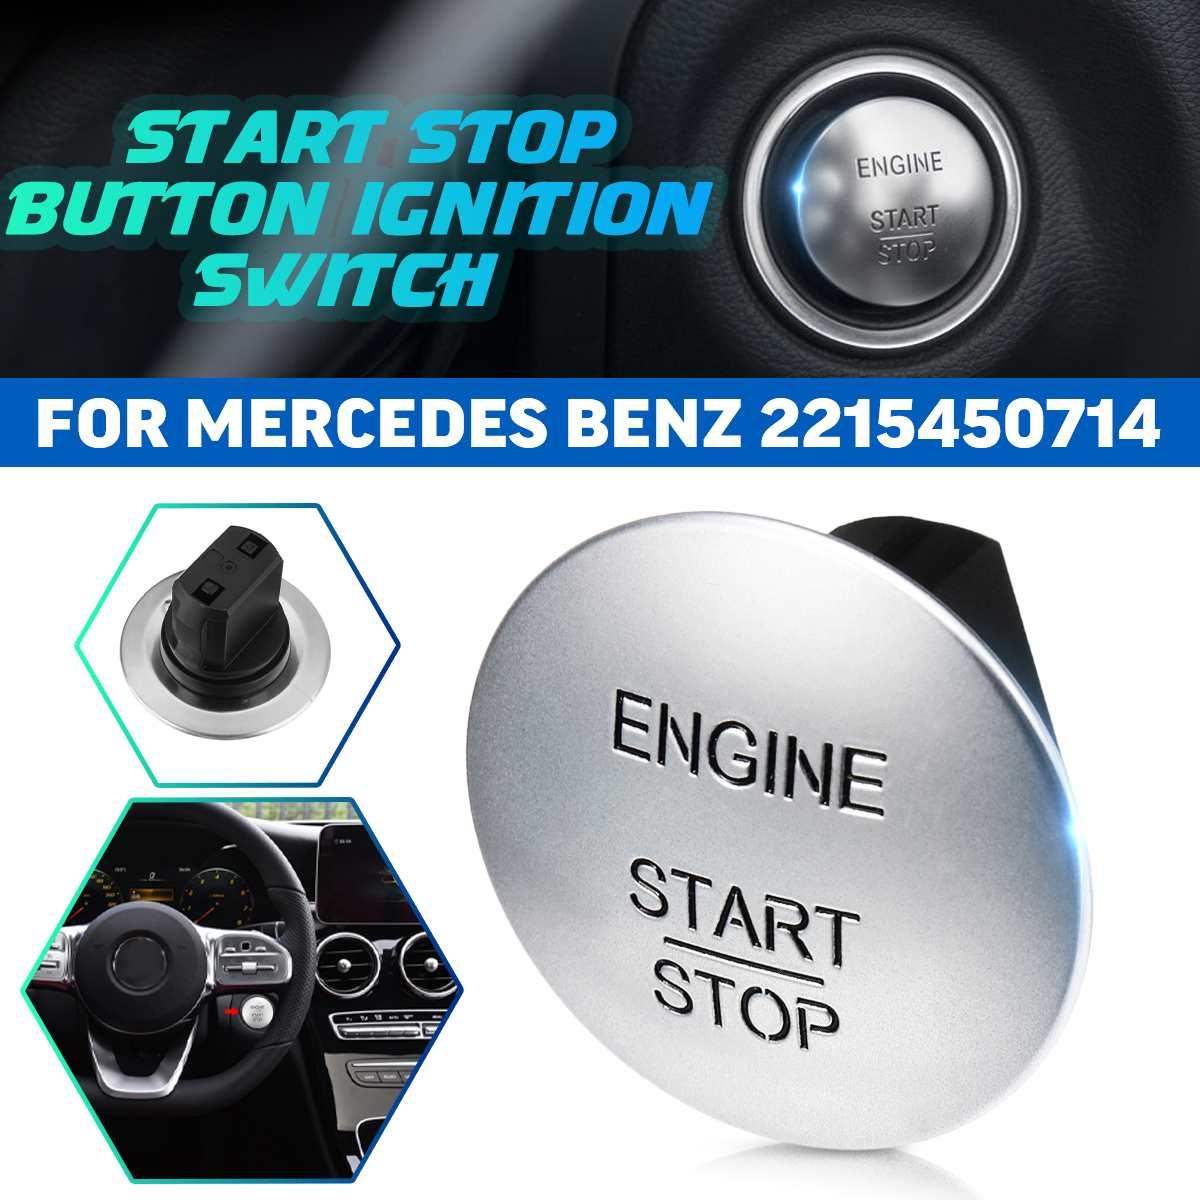 2215450714 Start Stop Push Button Ignition Switch Keyless For Mercedes-Benz CL550 E350 S550 GLK350 SLK200 CLS350 SLK350